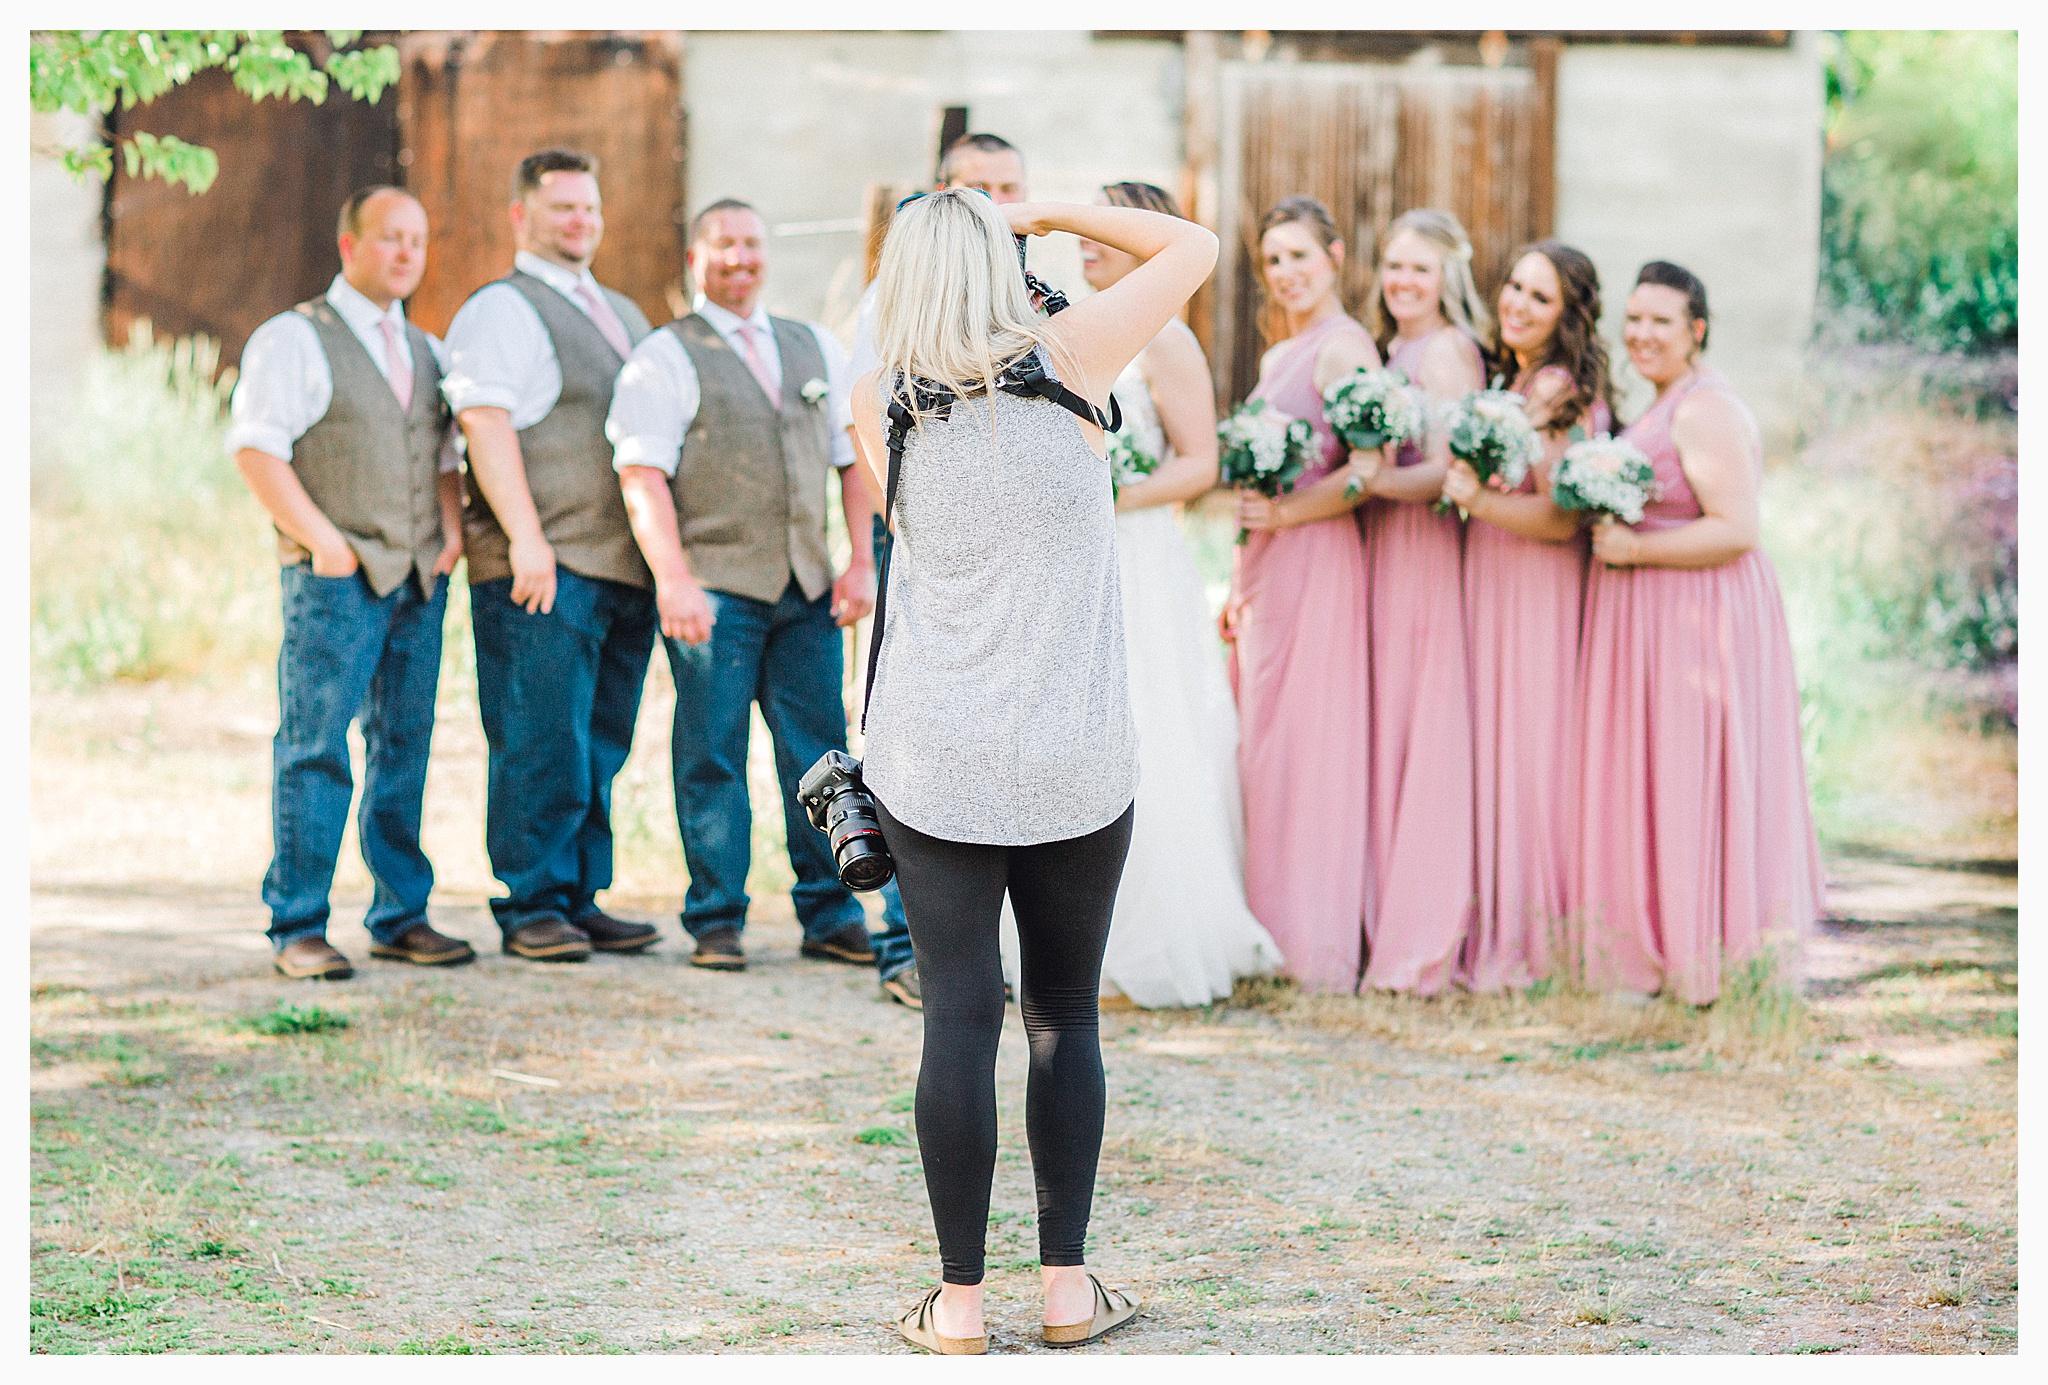 Rustic barn wedding in Wenatchee Washington at Sunshine Ranch on Easy Street, Emma Rose Company Seattle PNW Light and Airy Wedding Photographer_0094.jpg